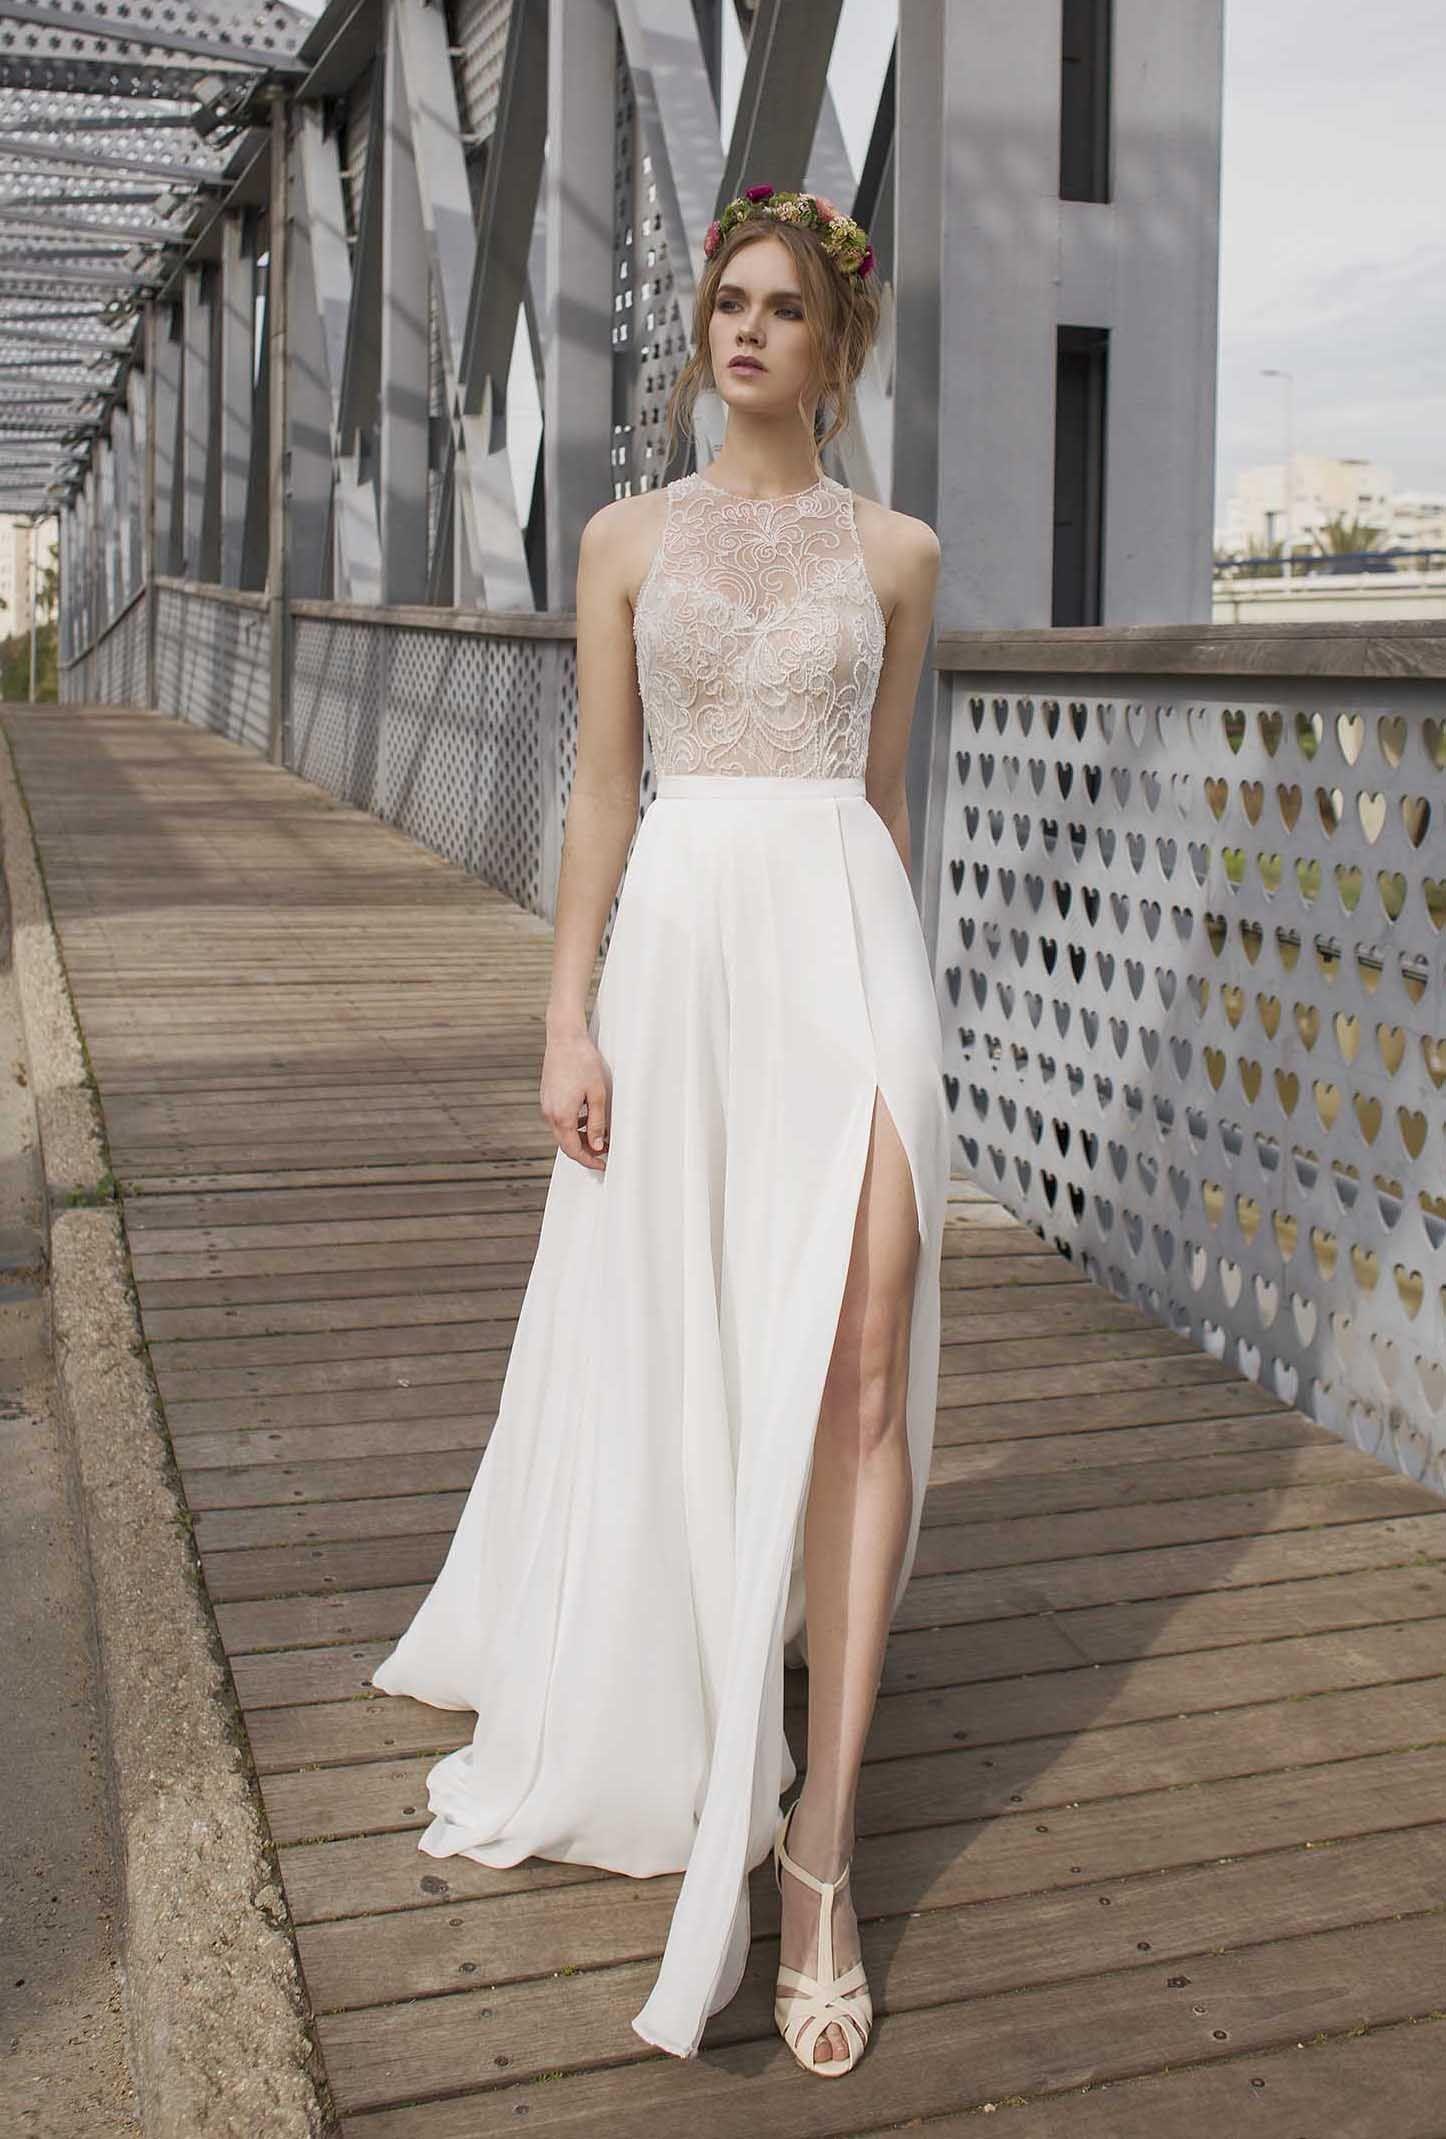 Womens dresses dolcestercom trendyfashionstyle pinterest